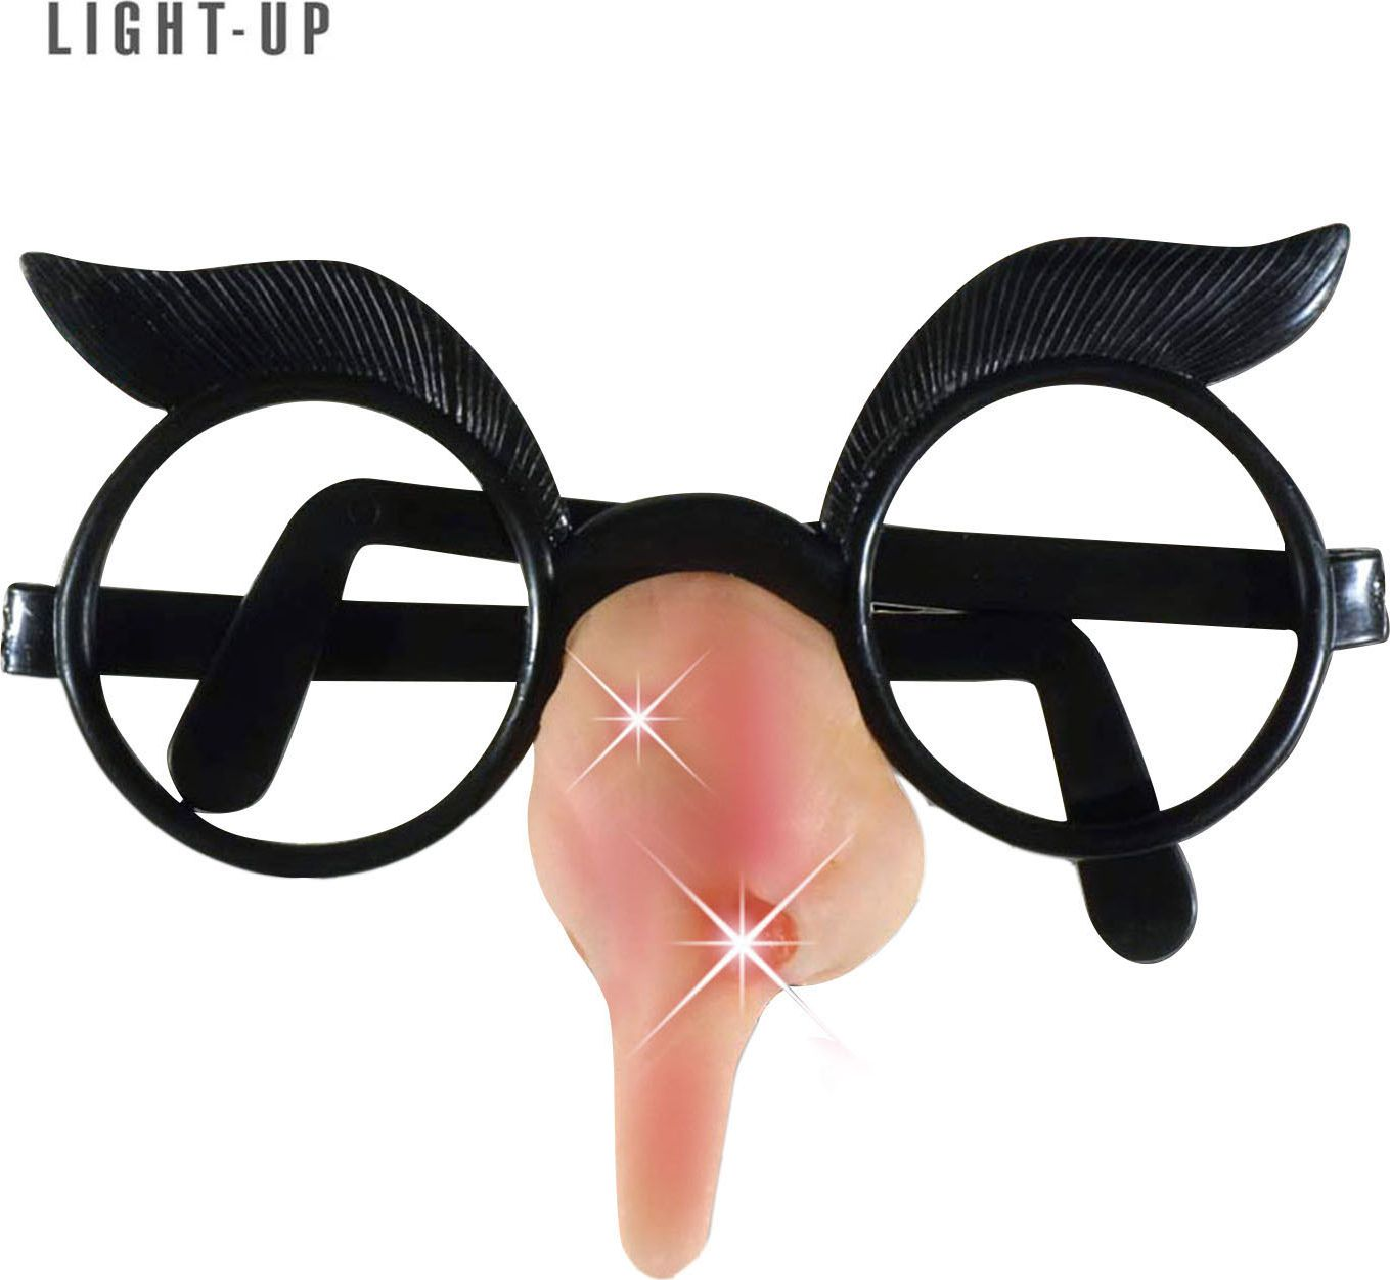 Zwarte lichtgevende heksenbril met neus